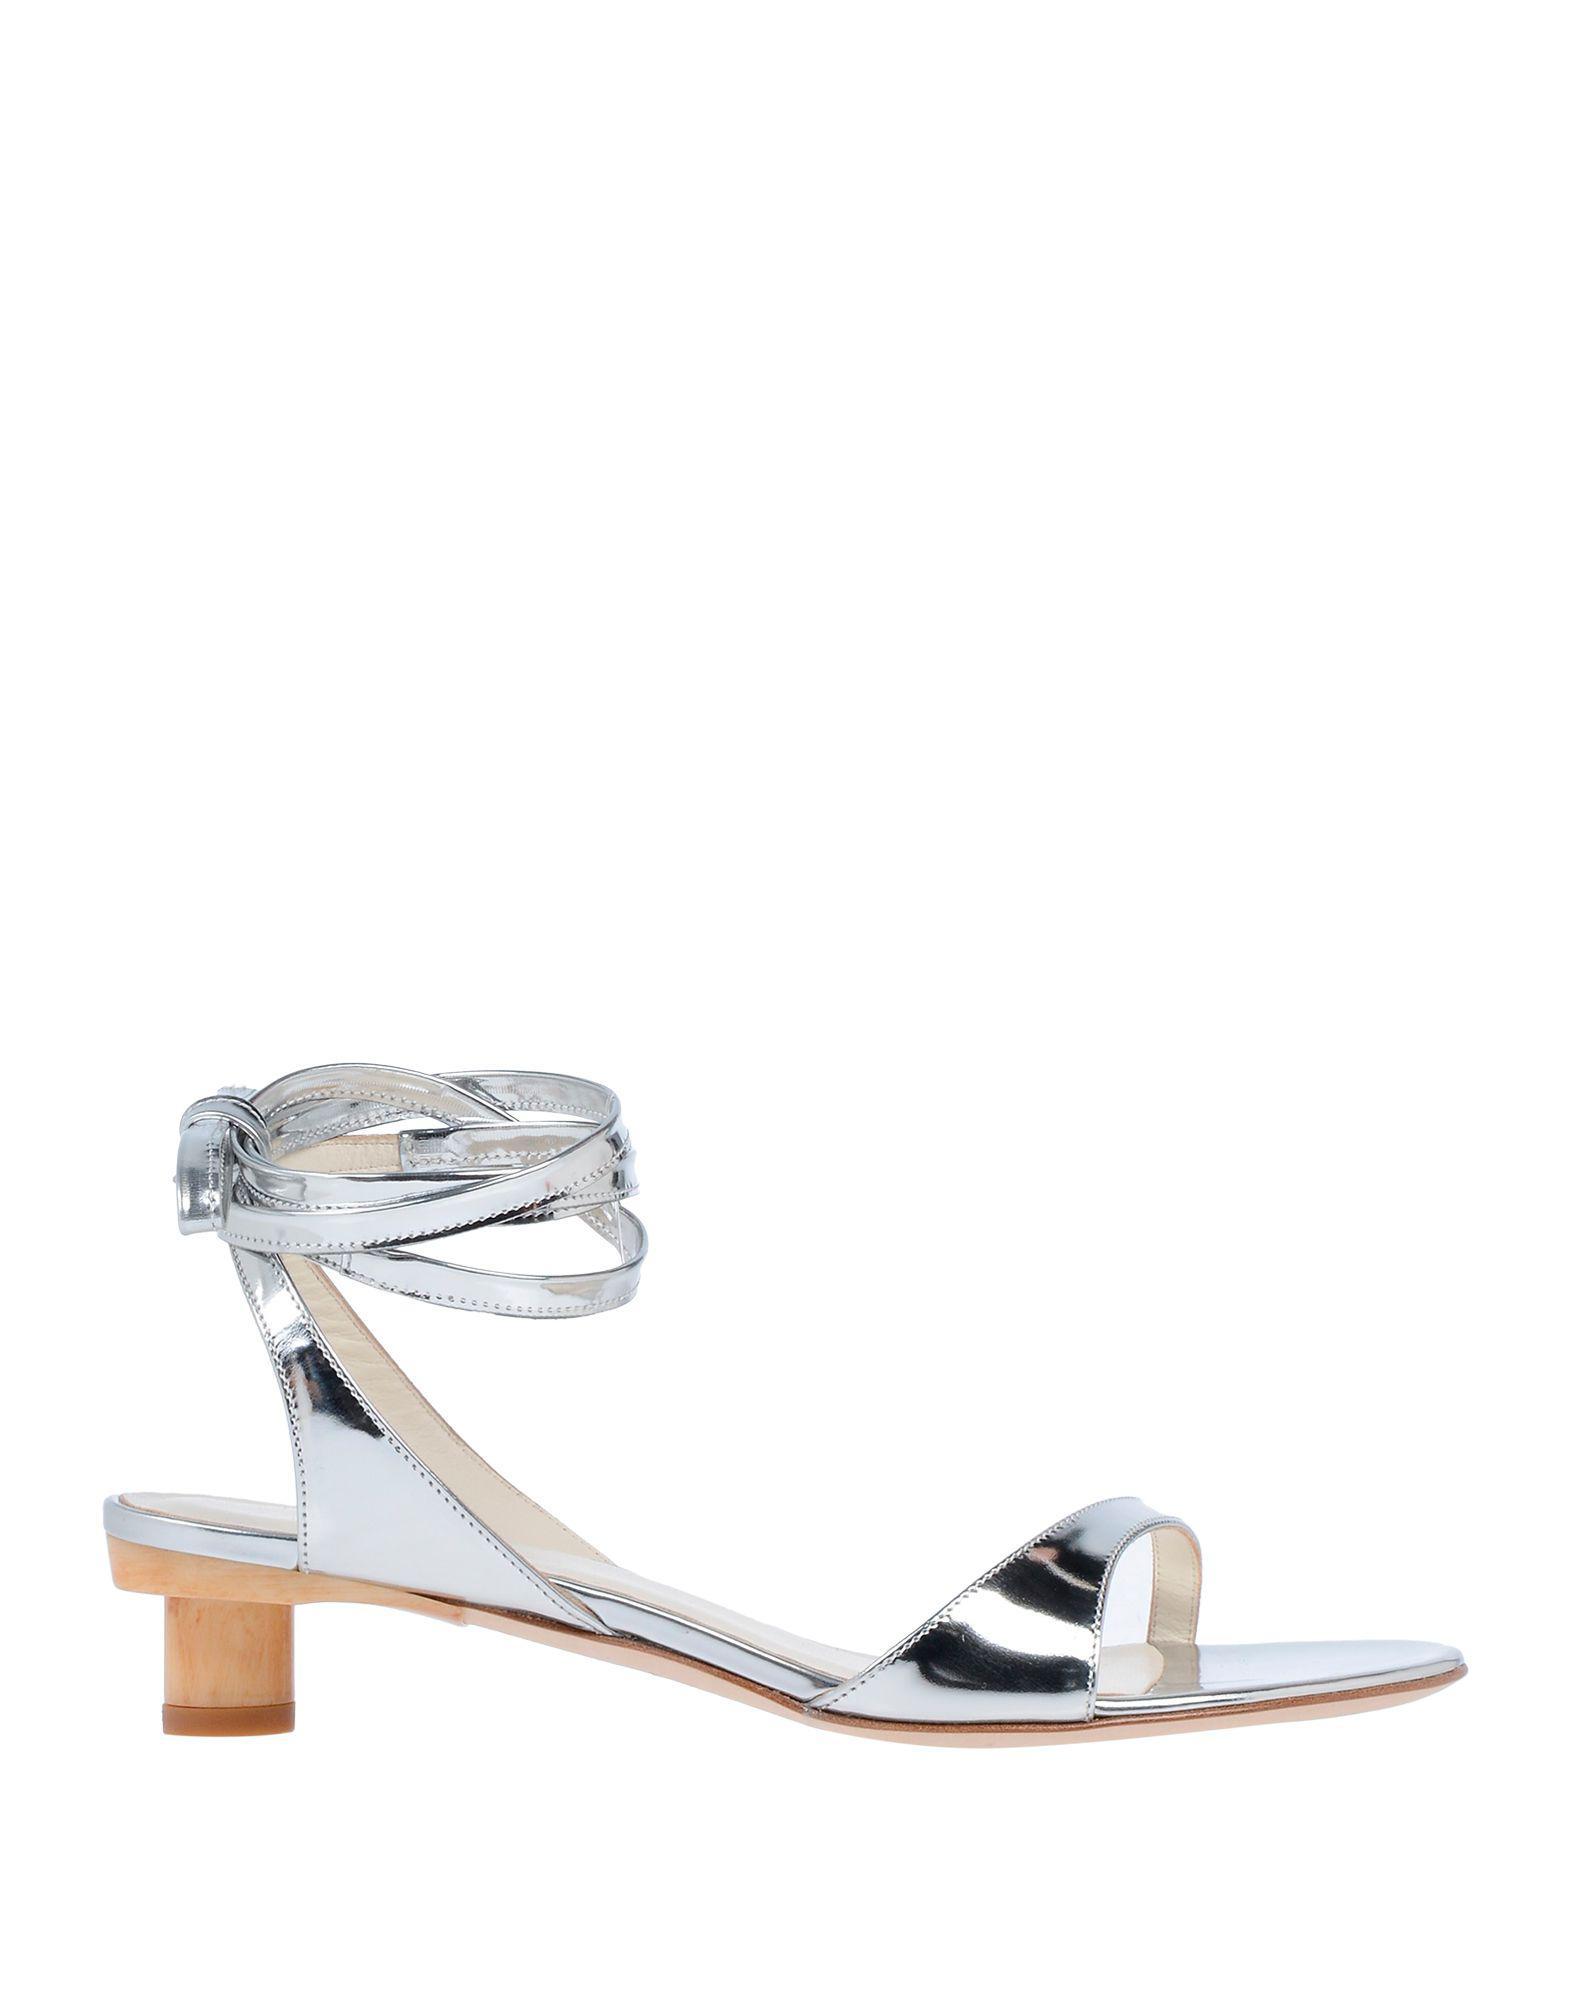 f93caf482 Lyst - Tibi Sandals in Metallic